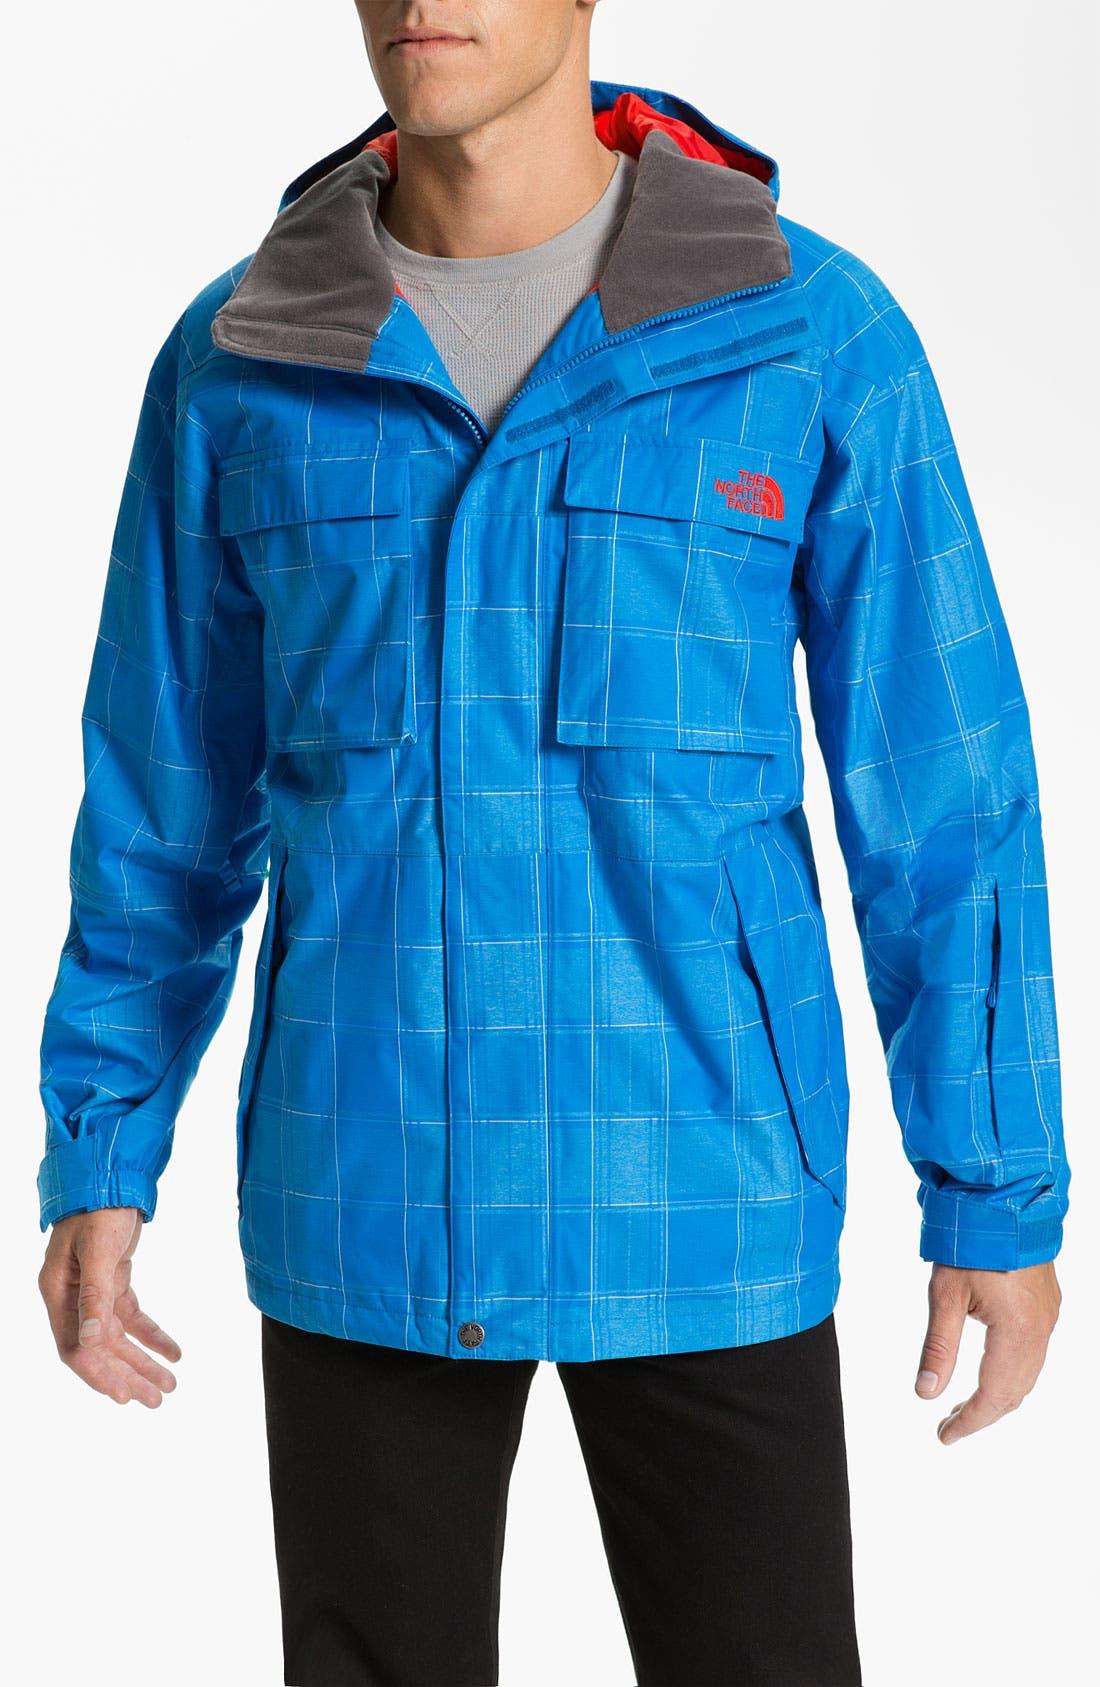 Alternate Image 1 Selected - The North Face 'Alki' Waterproof Hooded Snowsport Jacket